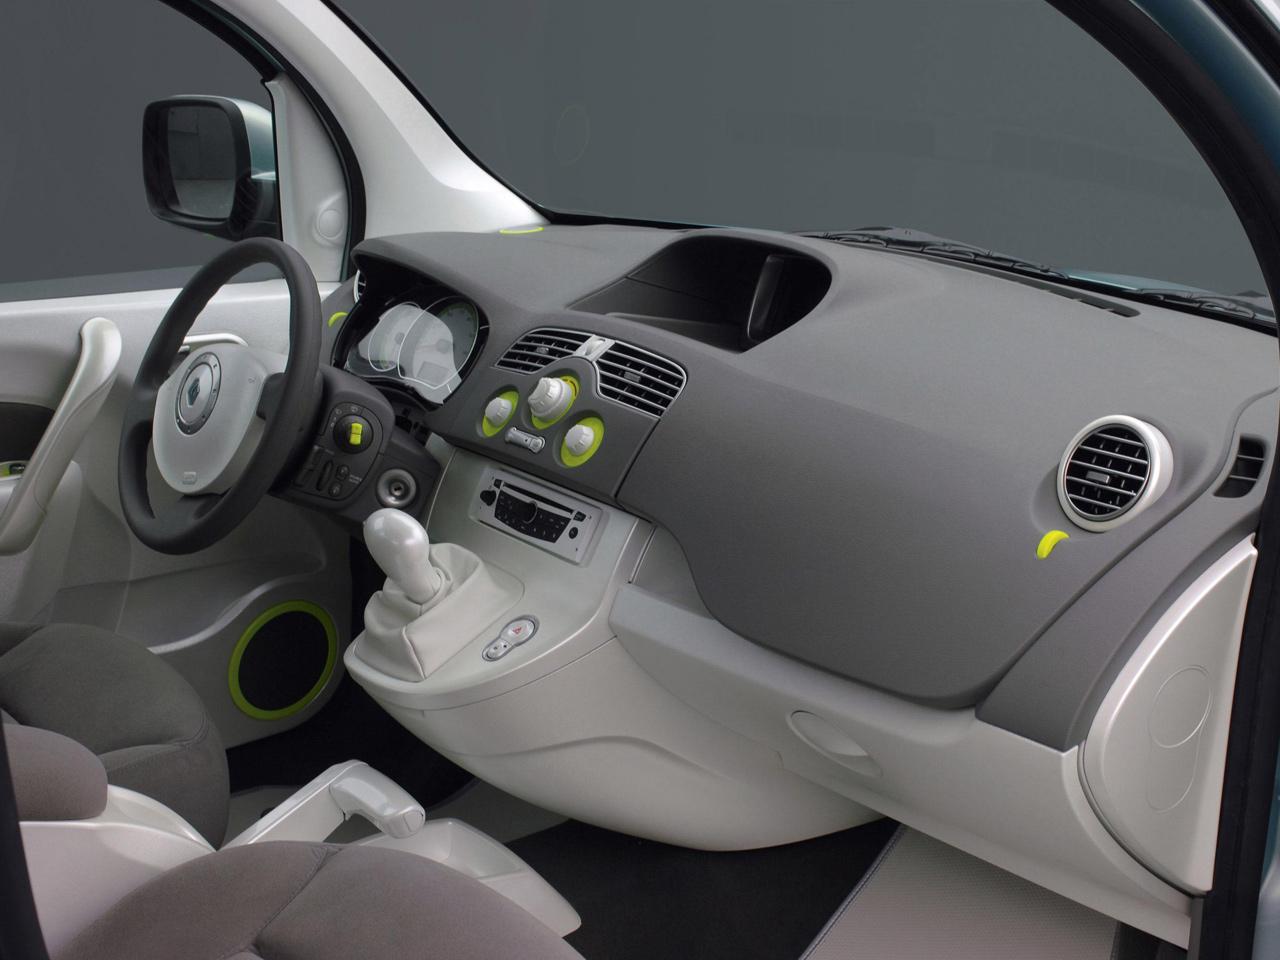 Компания Renault показала акционерам электрический фургон Kangoo (4